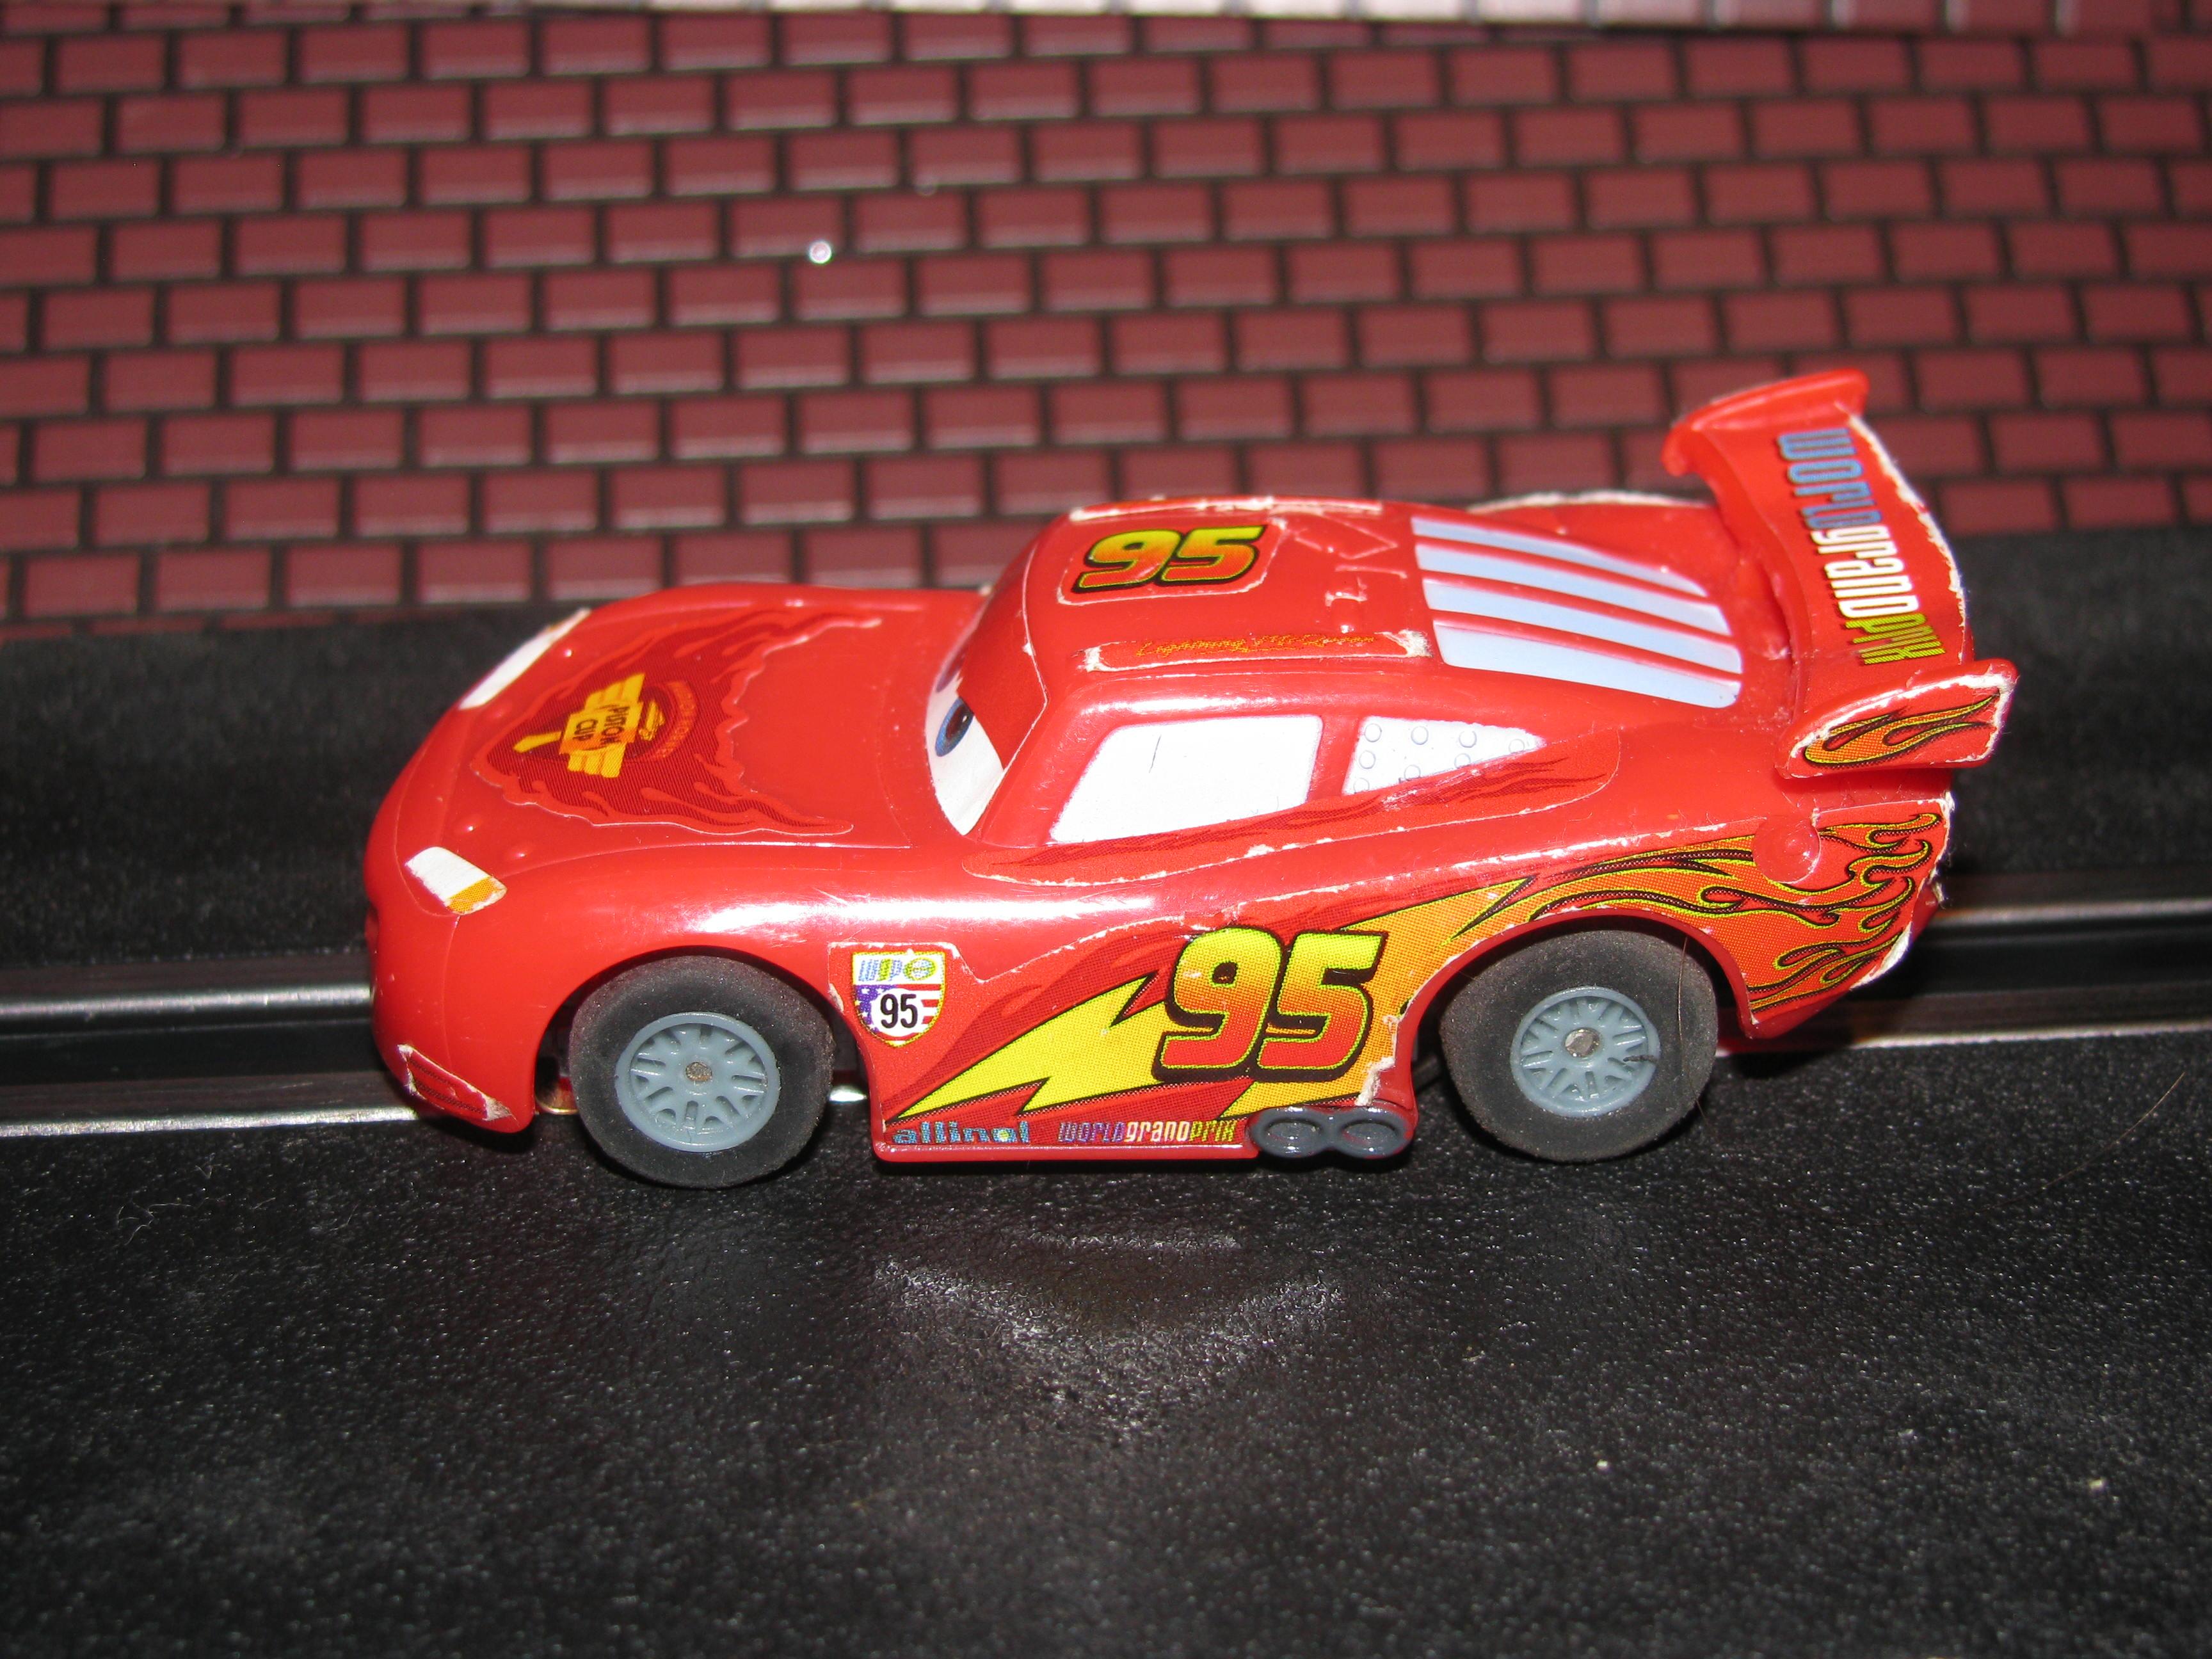 HO Slot Car #95 Lightning McQueen (Disney/Pixar) with Guide Post